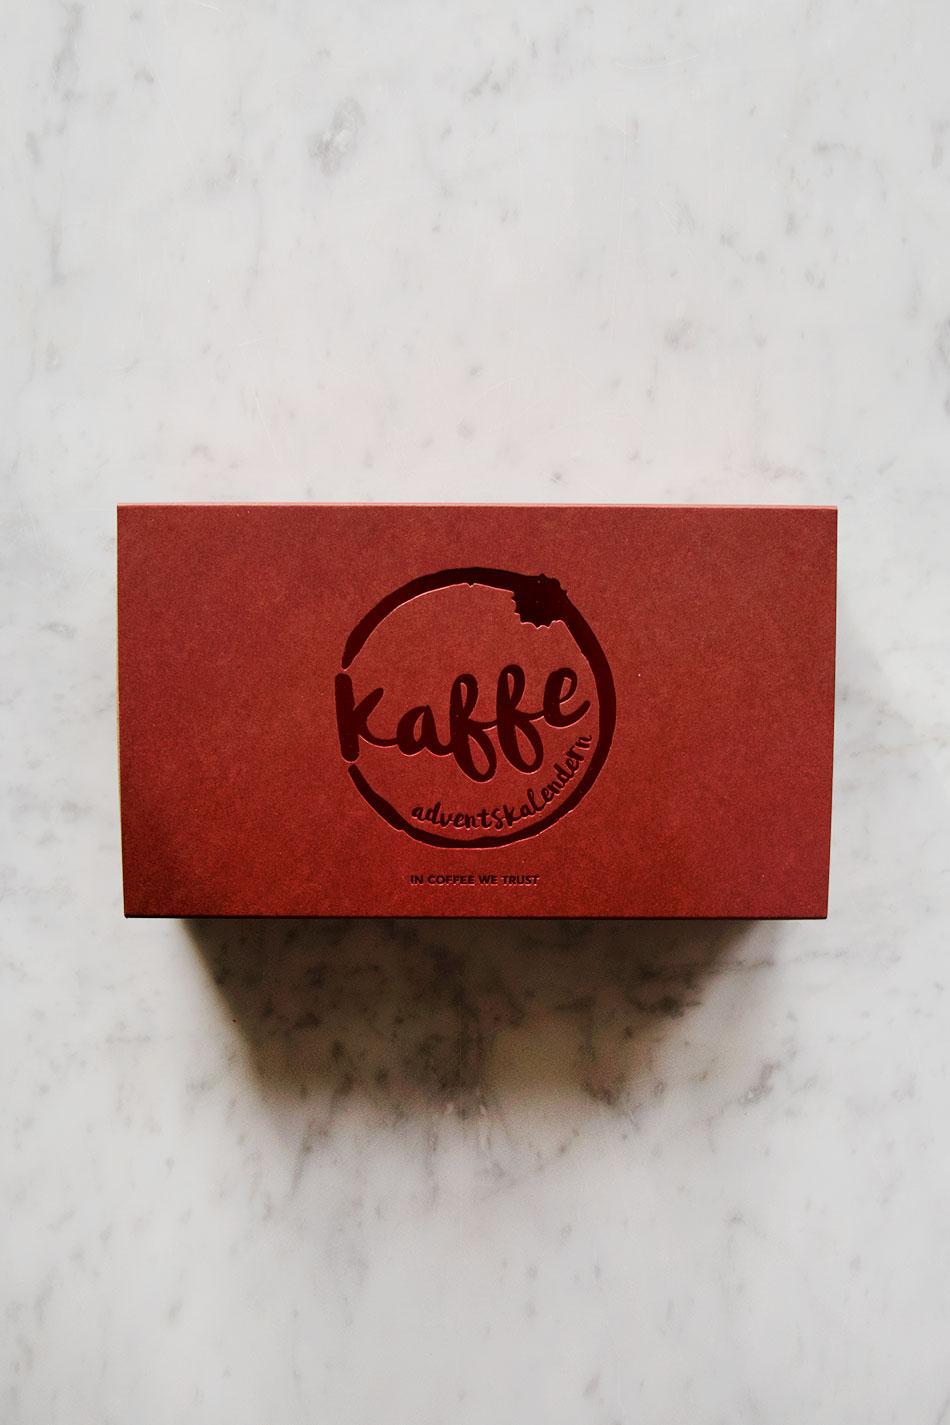 Kaffeadventskalendern 2019